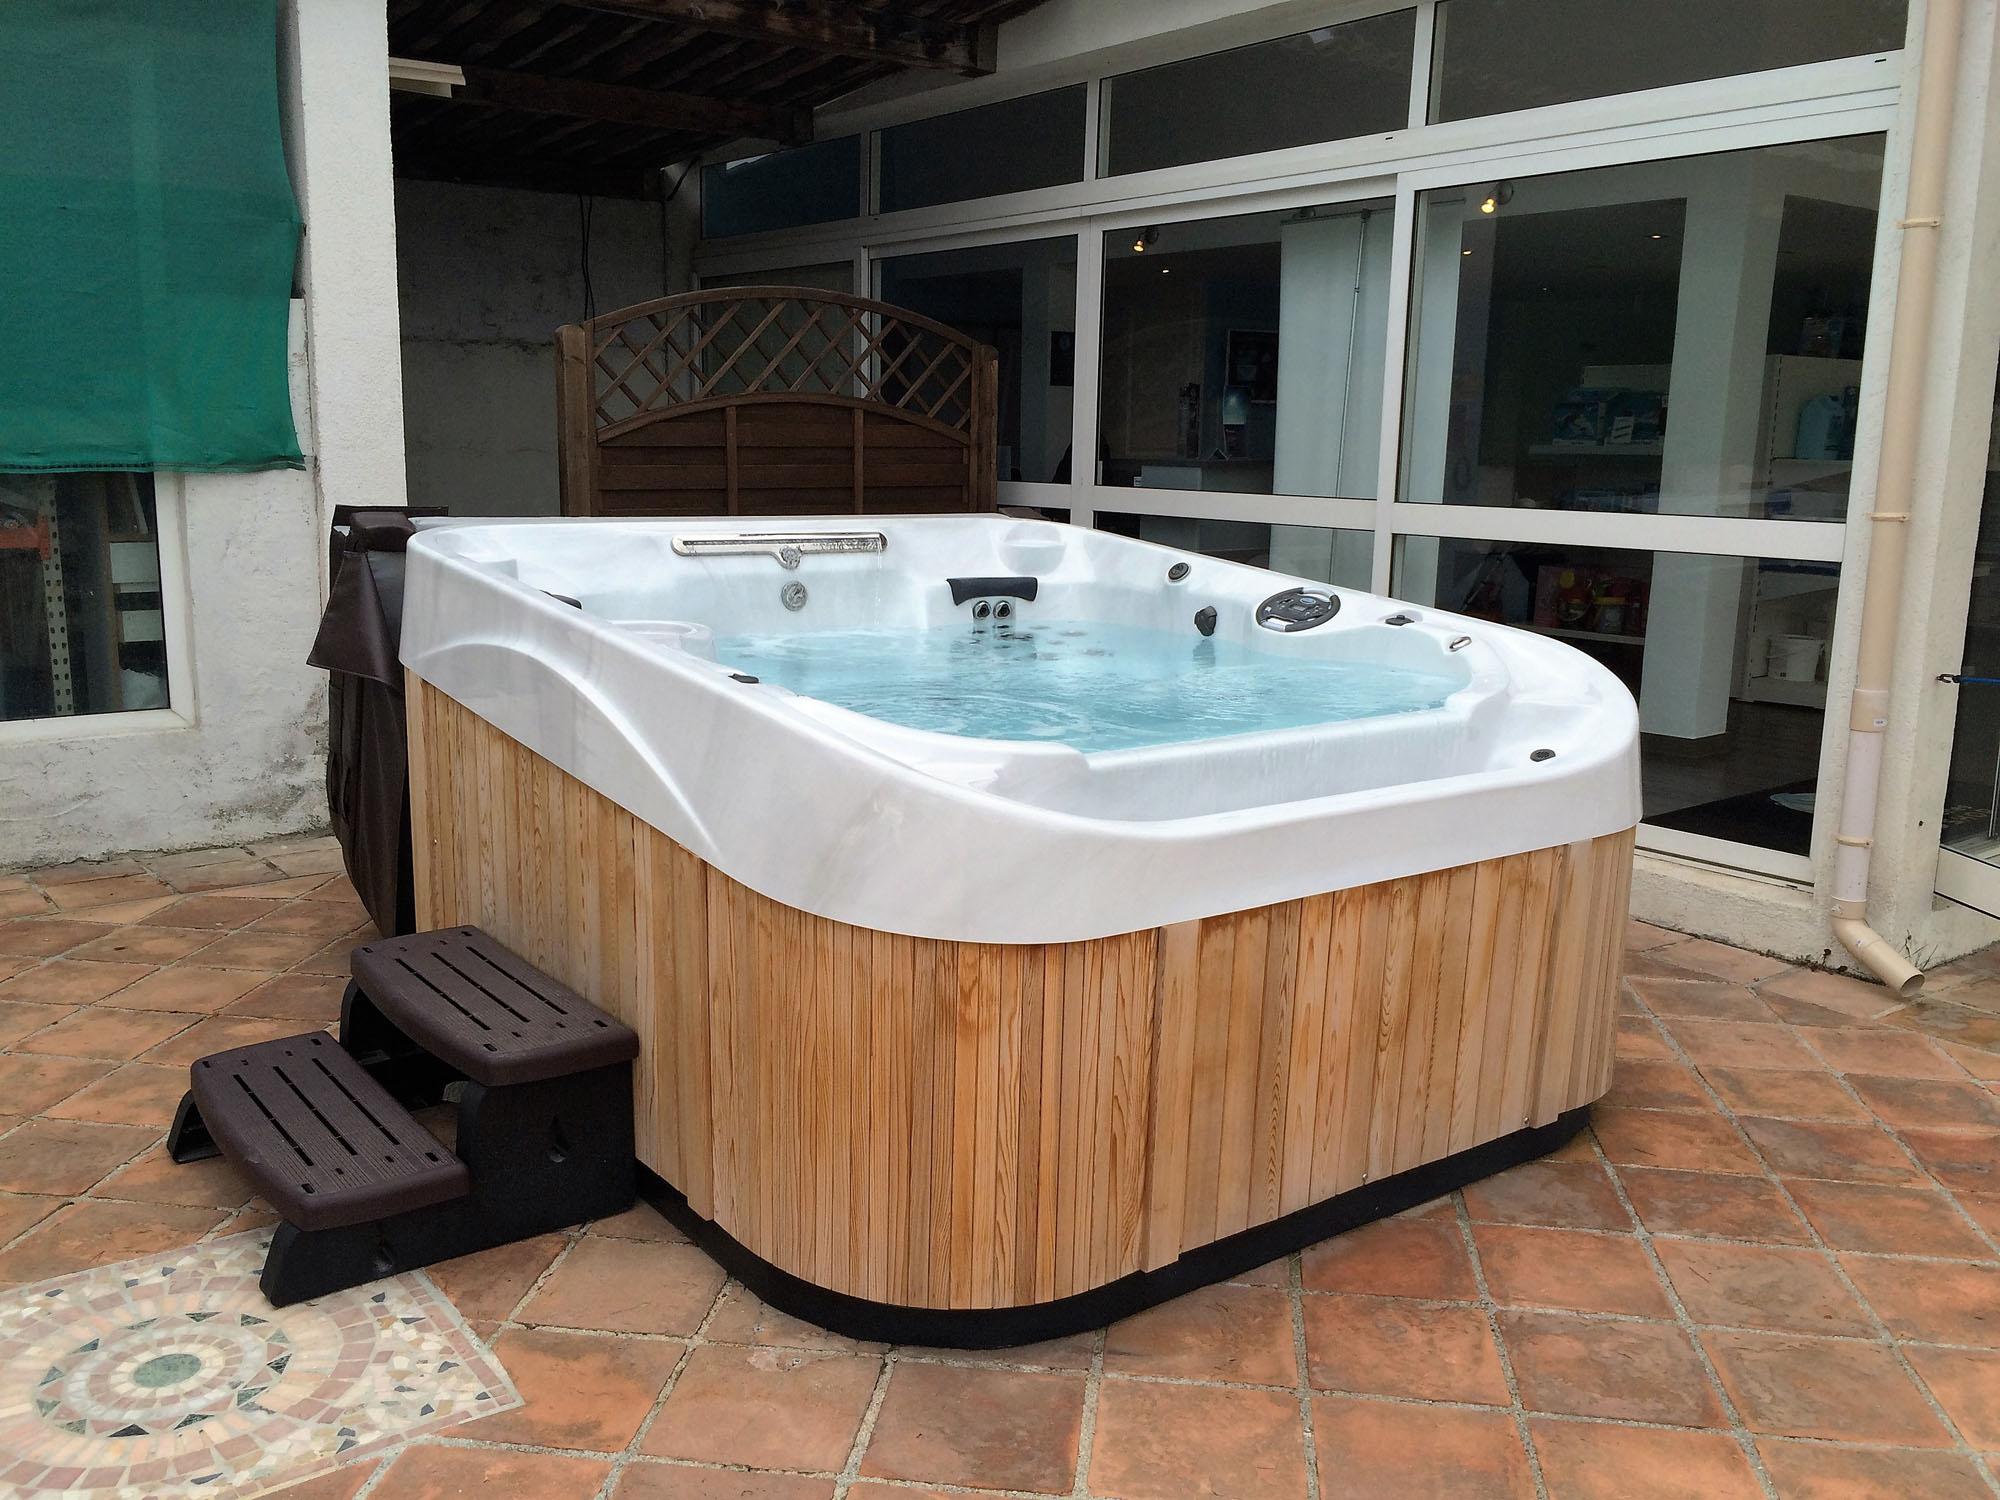 taille jacuzzi spa capuchon pour garder spa propre chaud. Black Bedroom Furniture Sets. Home Design Ideas